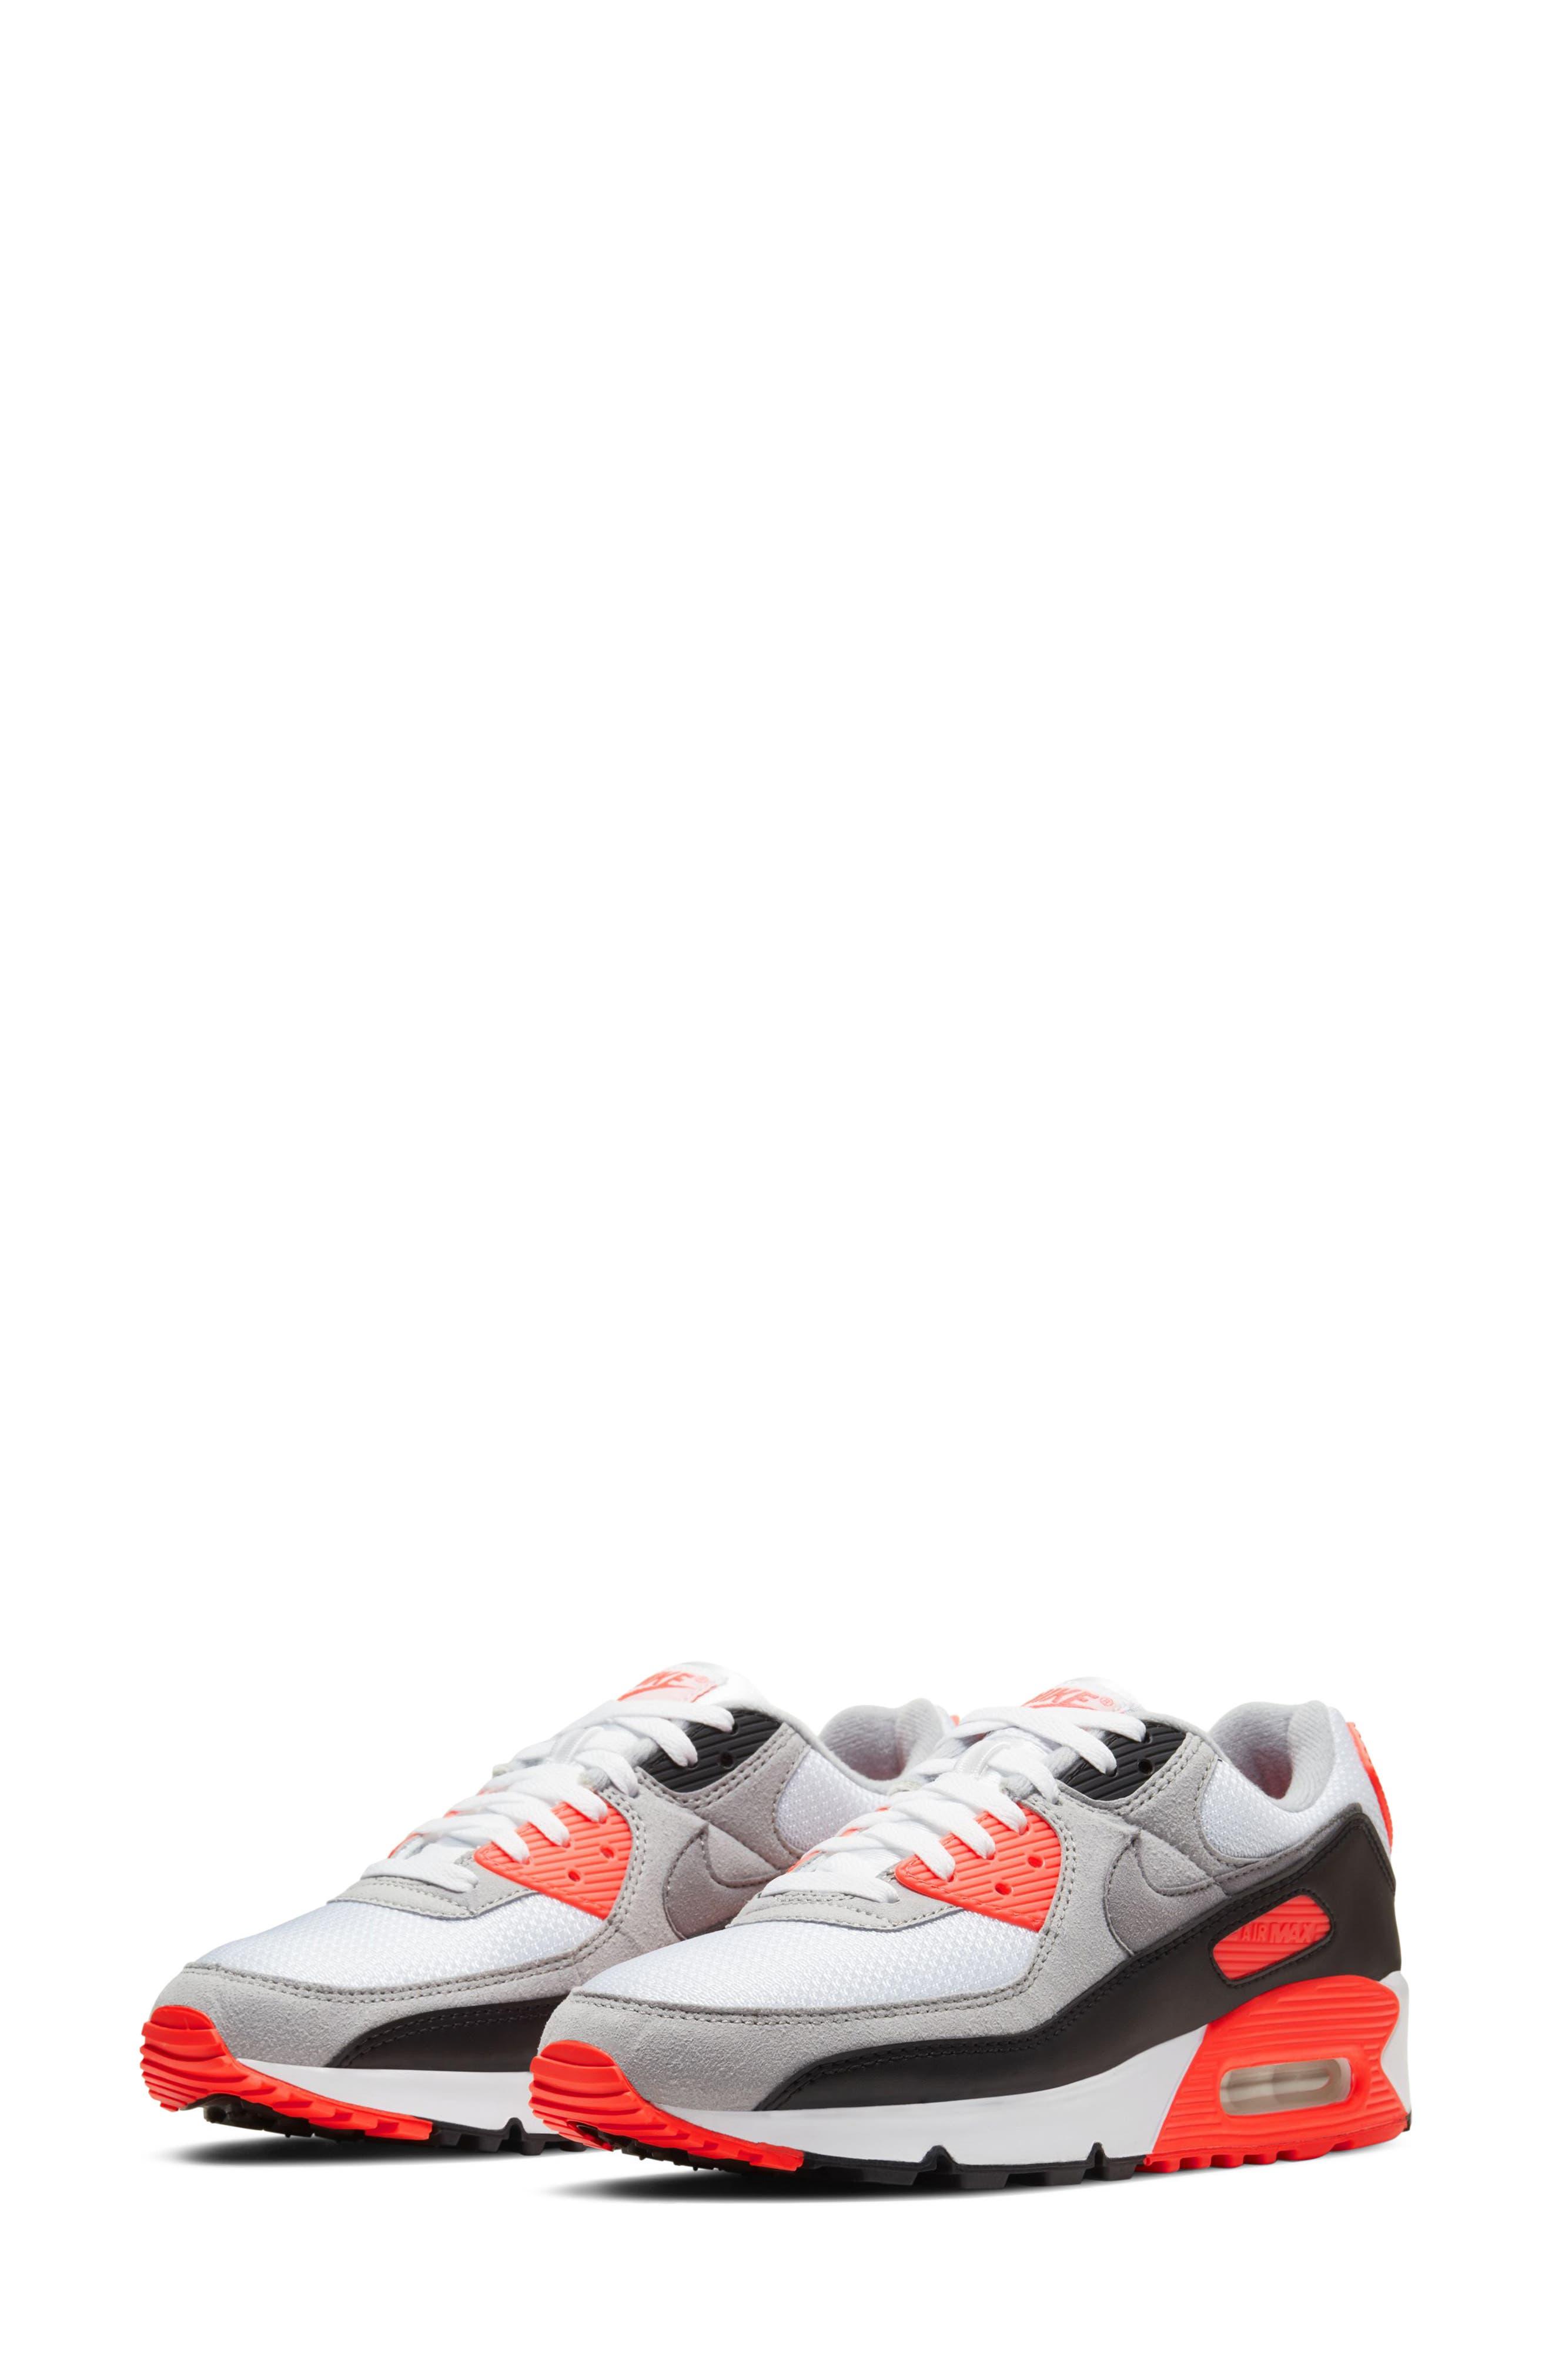 For Men Shop All Nordstrom X Nike